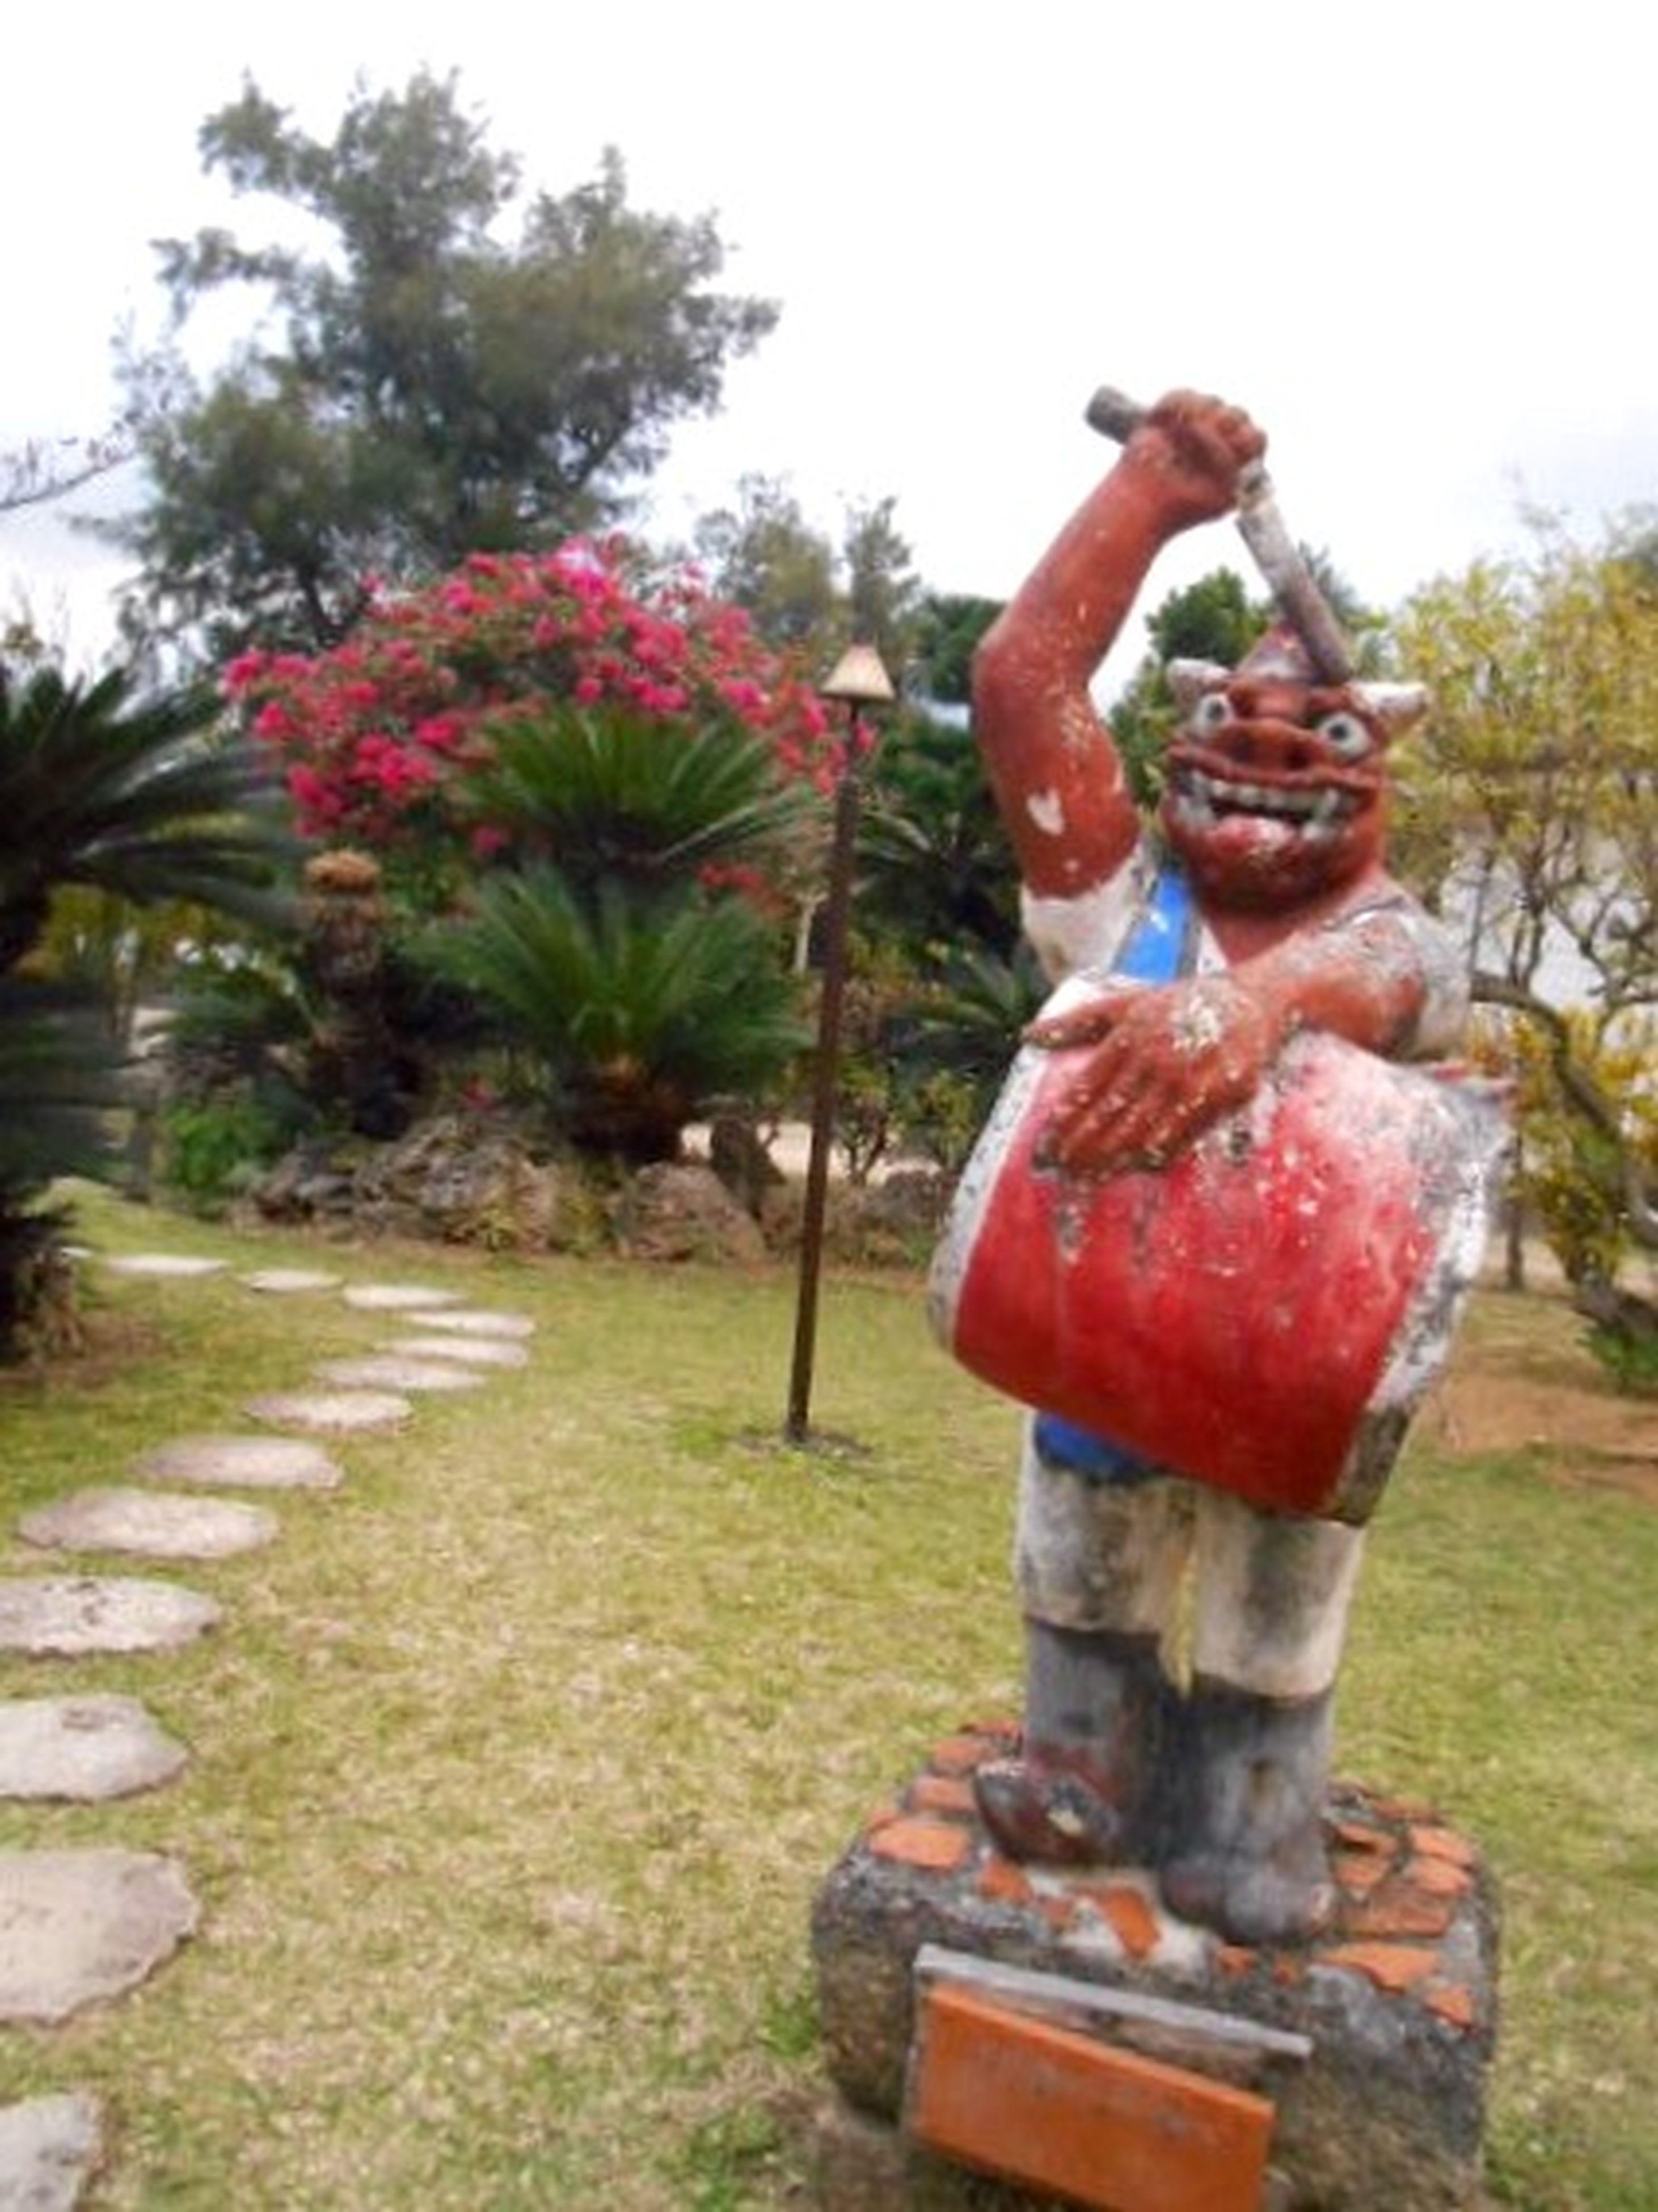 statue, sculpture, human representation, art, art and craft, tree, creativity, park - man made space, animal representation, religion, sky, day, buddha, outdoors, full length